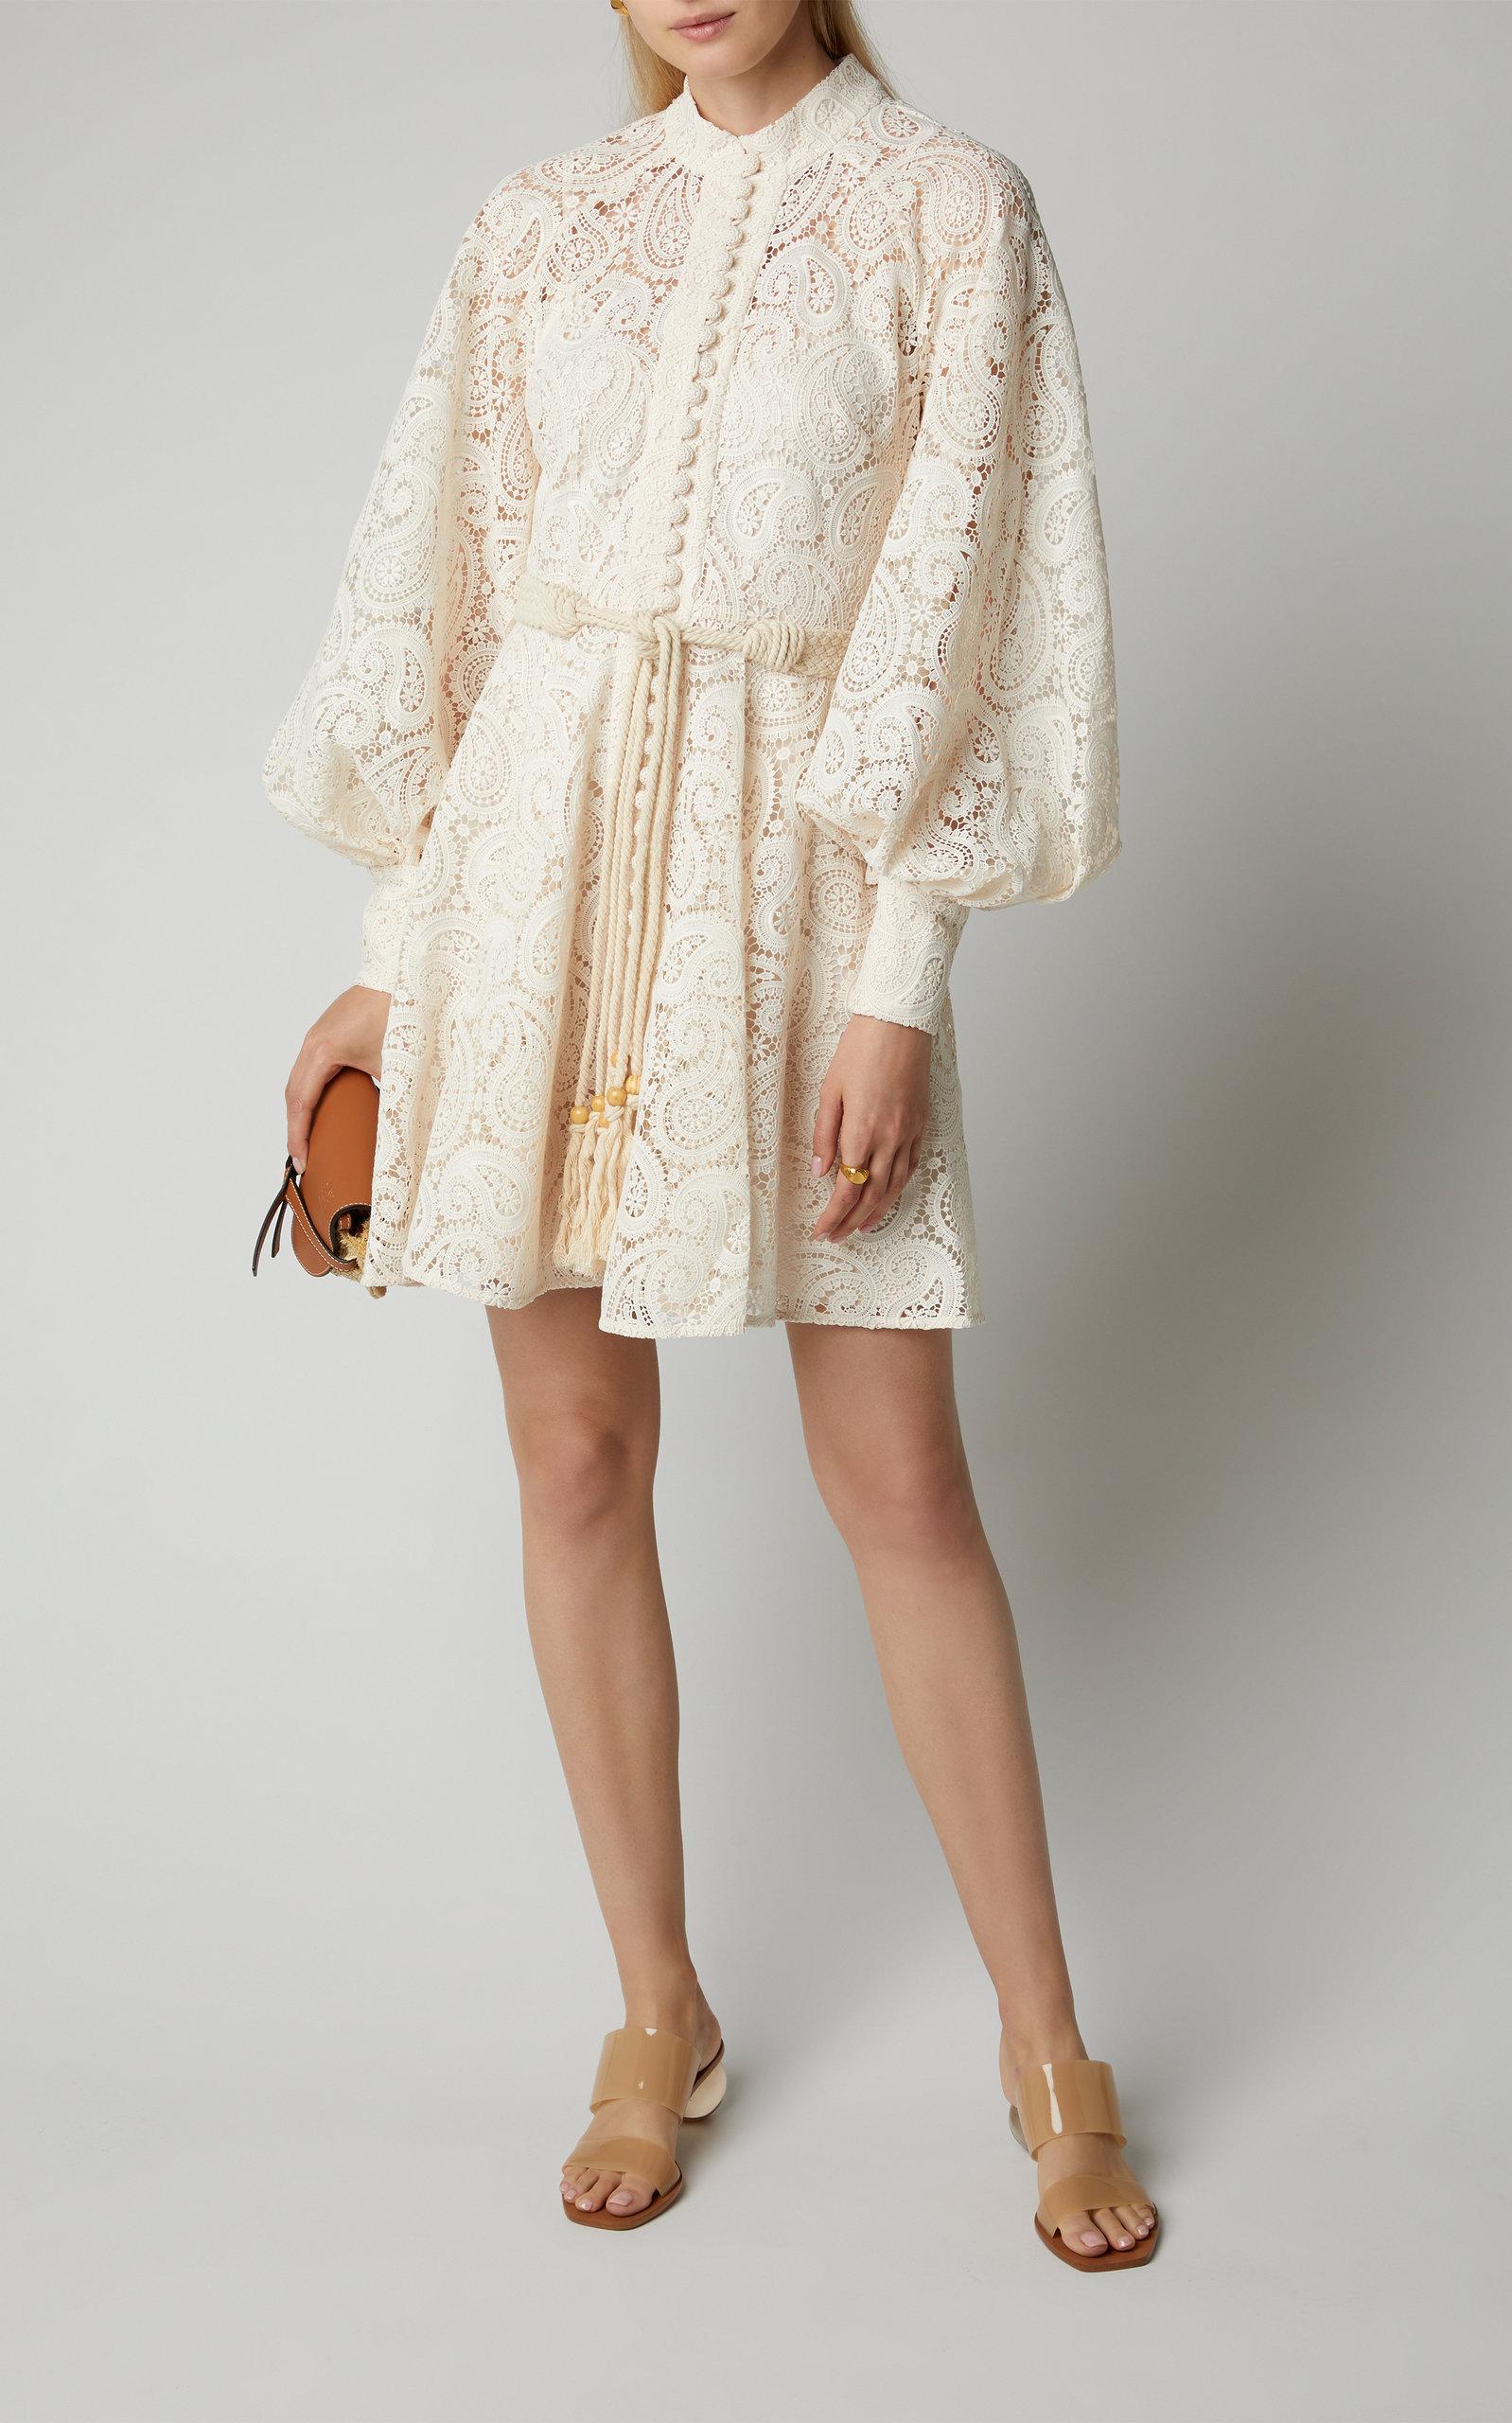 Zimmermann Dresses Amari Belted Lace Mini Dress